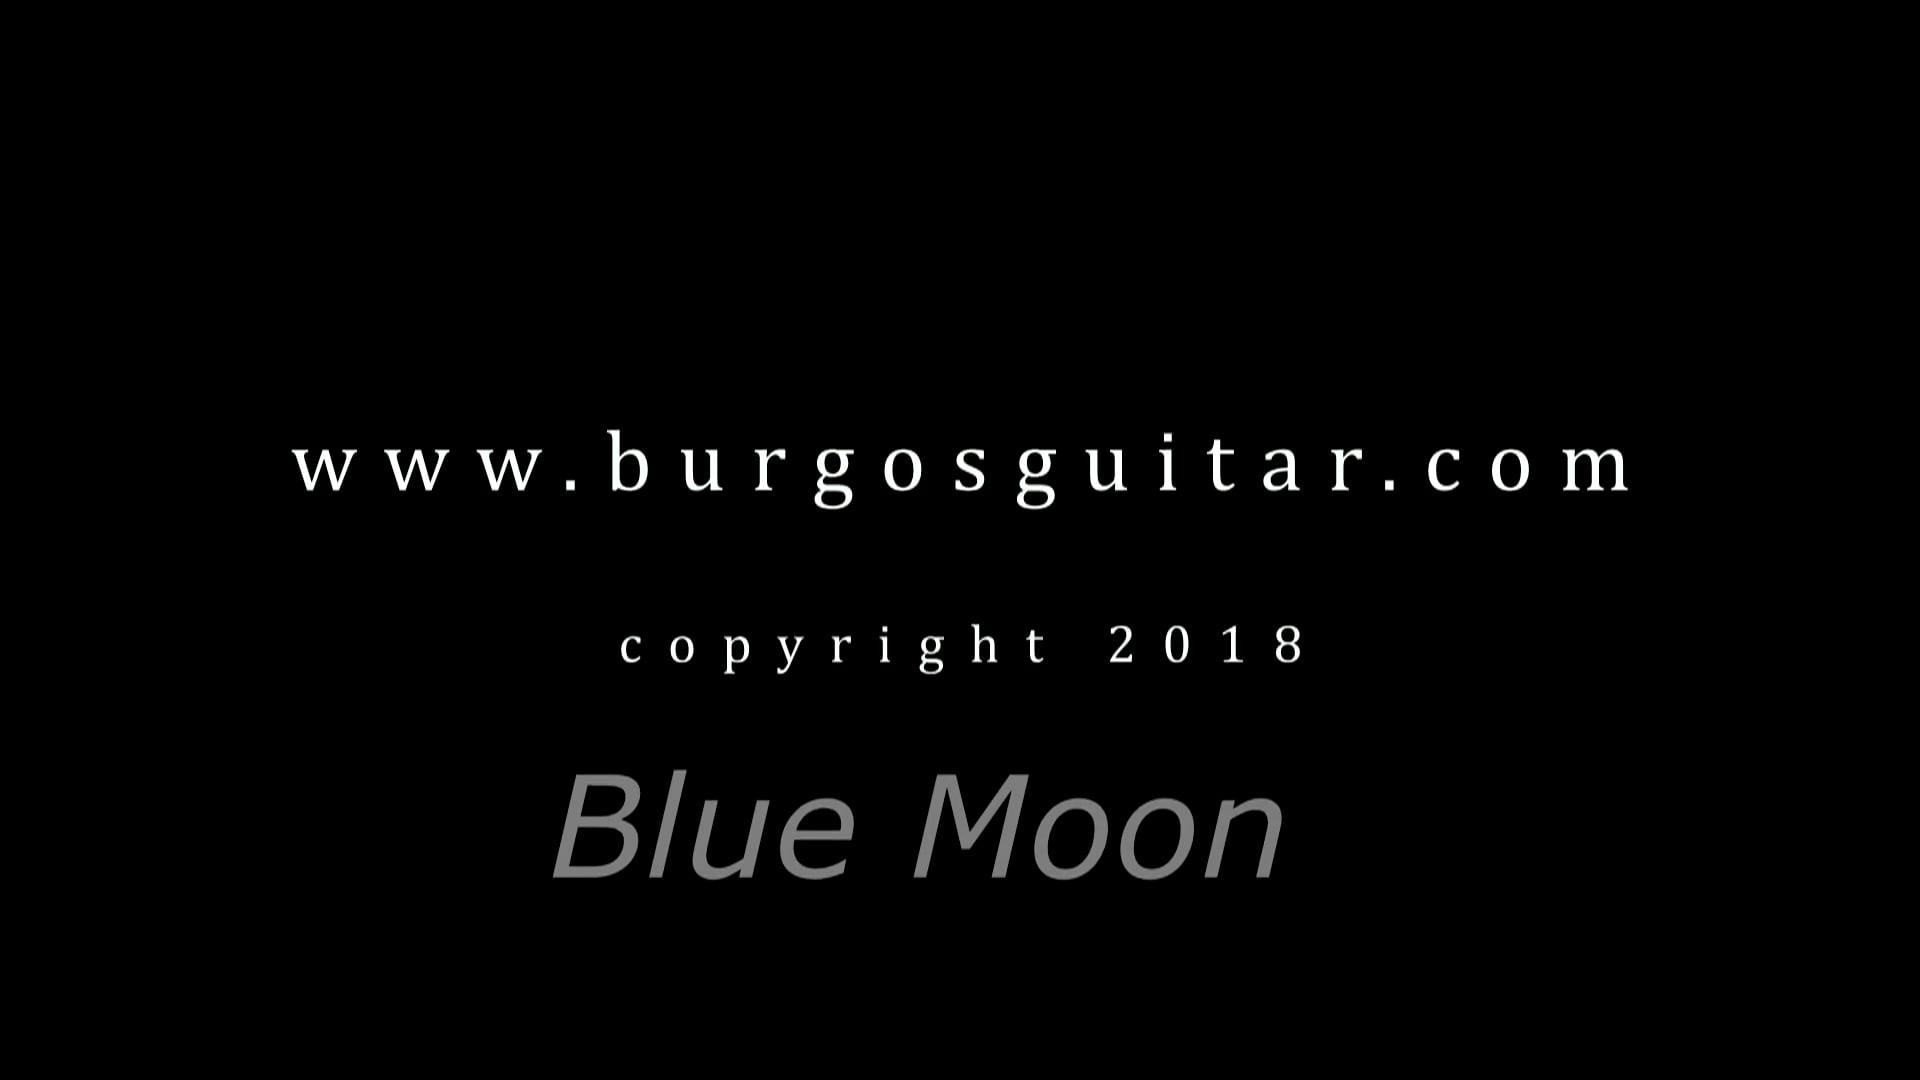 Blue Moon,Francisco Burgos, guitar